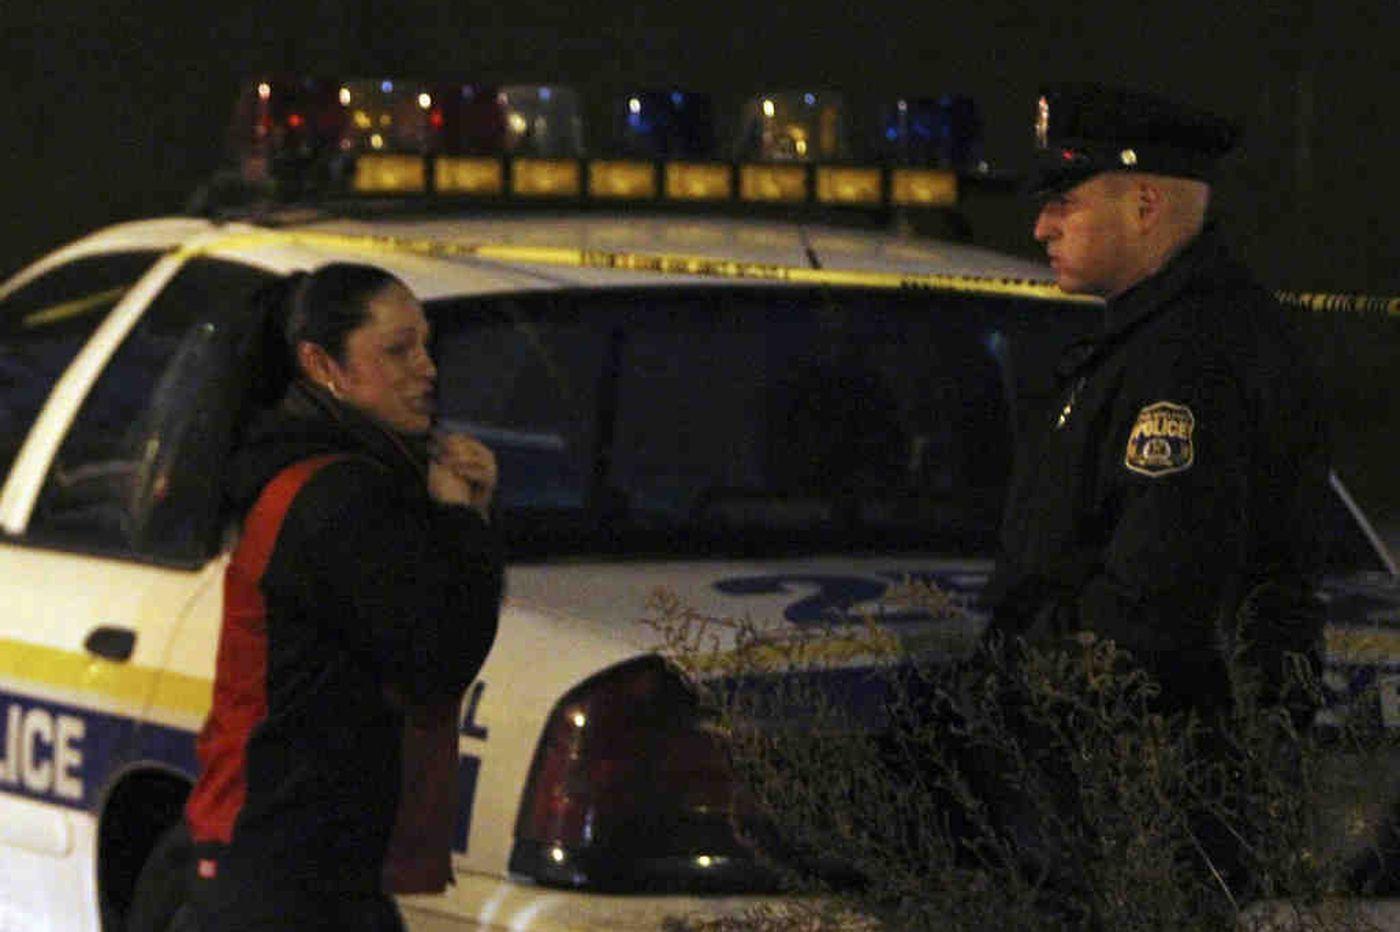 Fourth woman found dead in Kensington